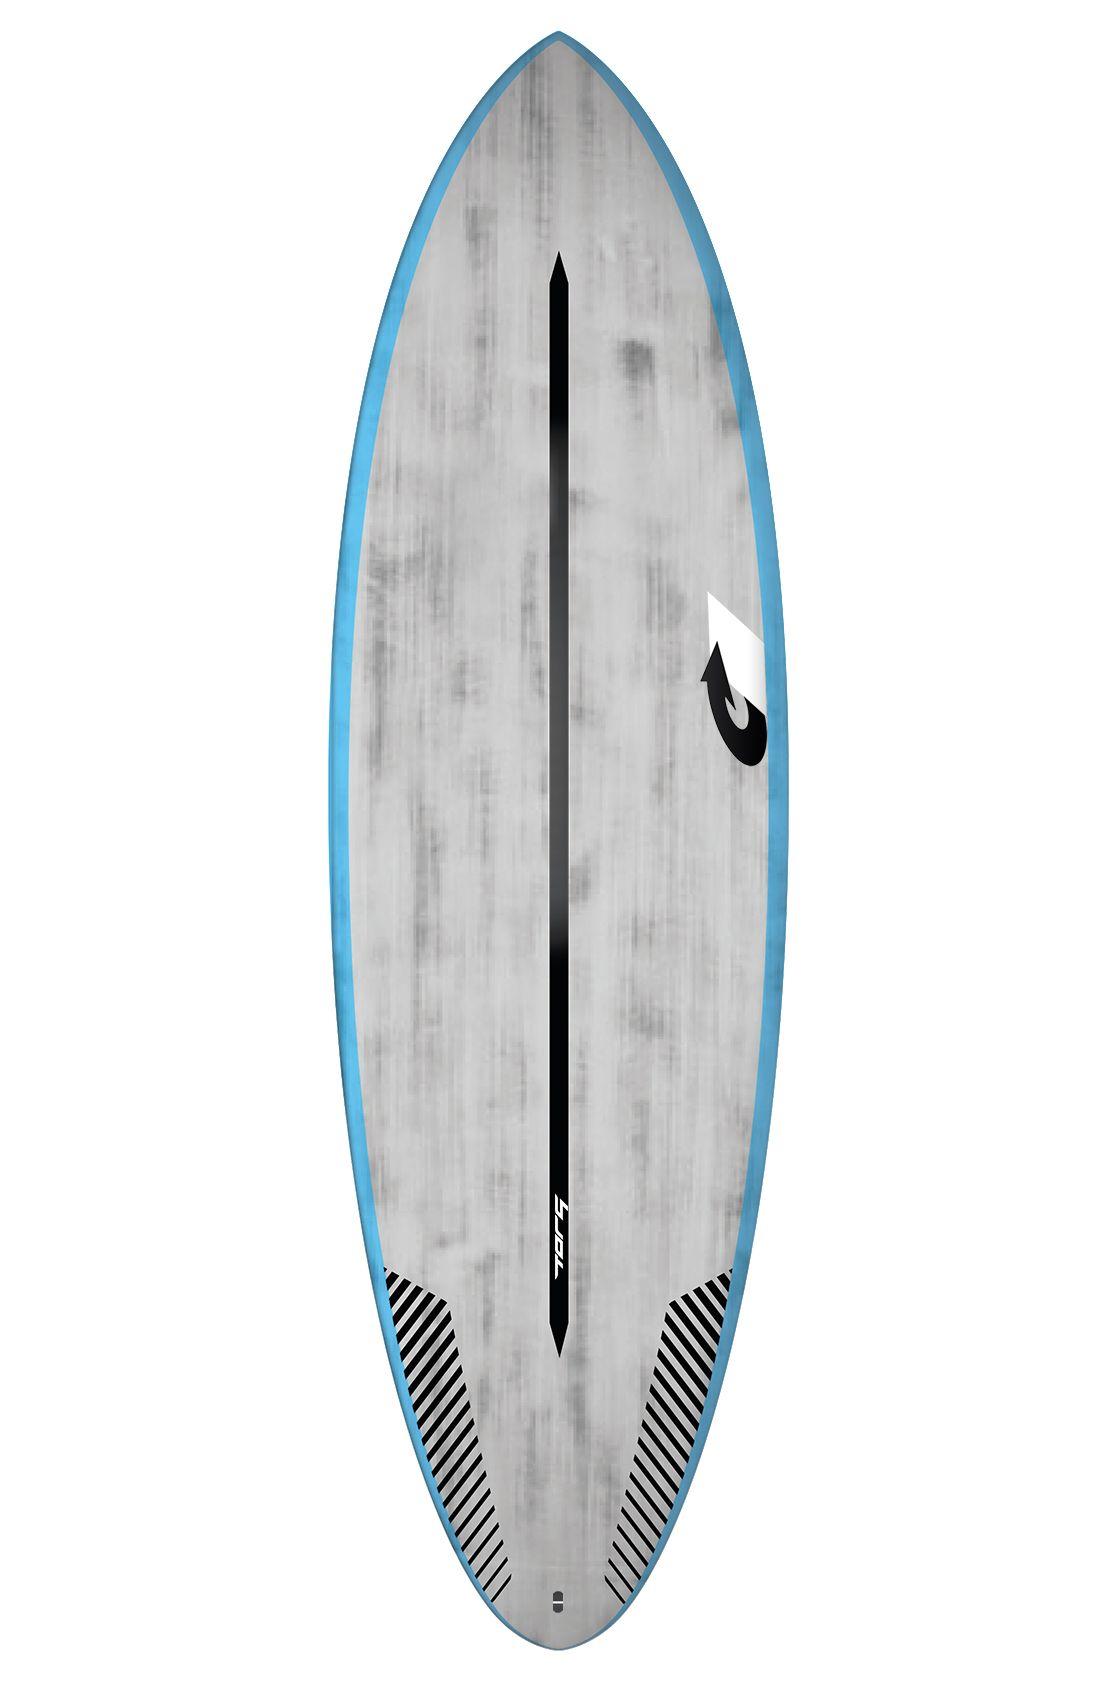 Prancha Surf Torq 6'10 BIGBOY 23 BLUE RAILS + BRUSHED GRAY Squash Tail - Color Futures Multisystem 6ft10